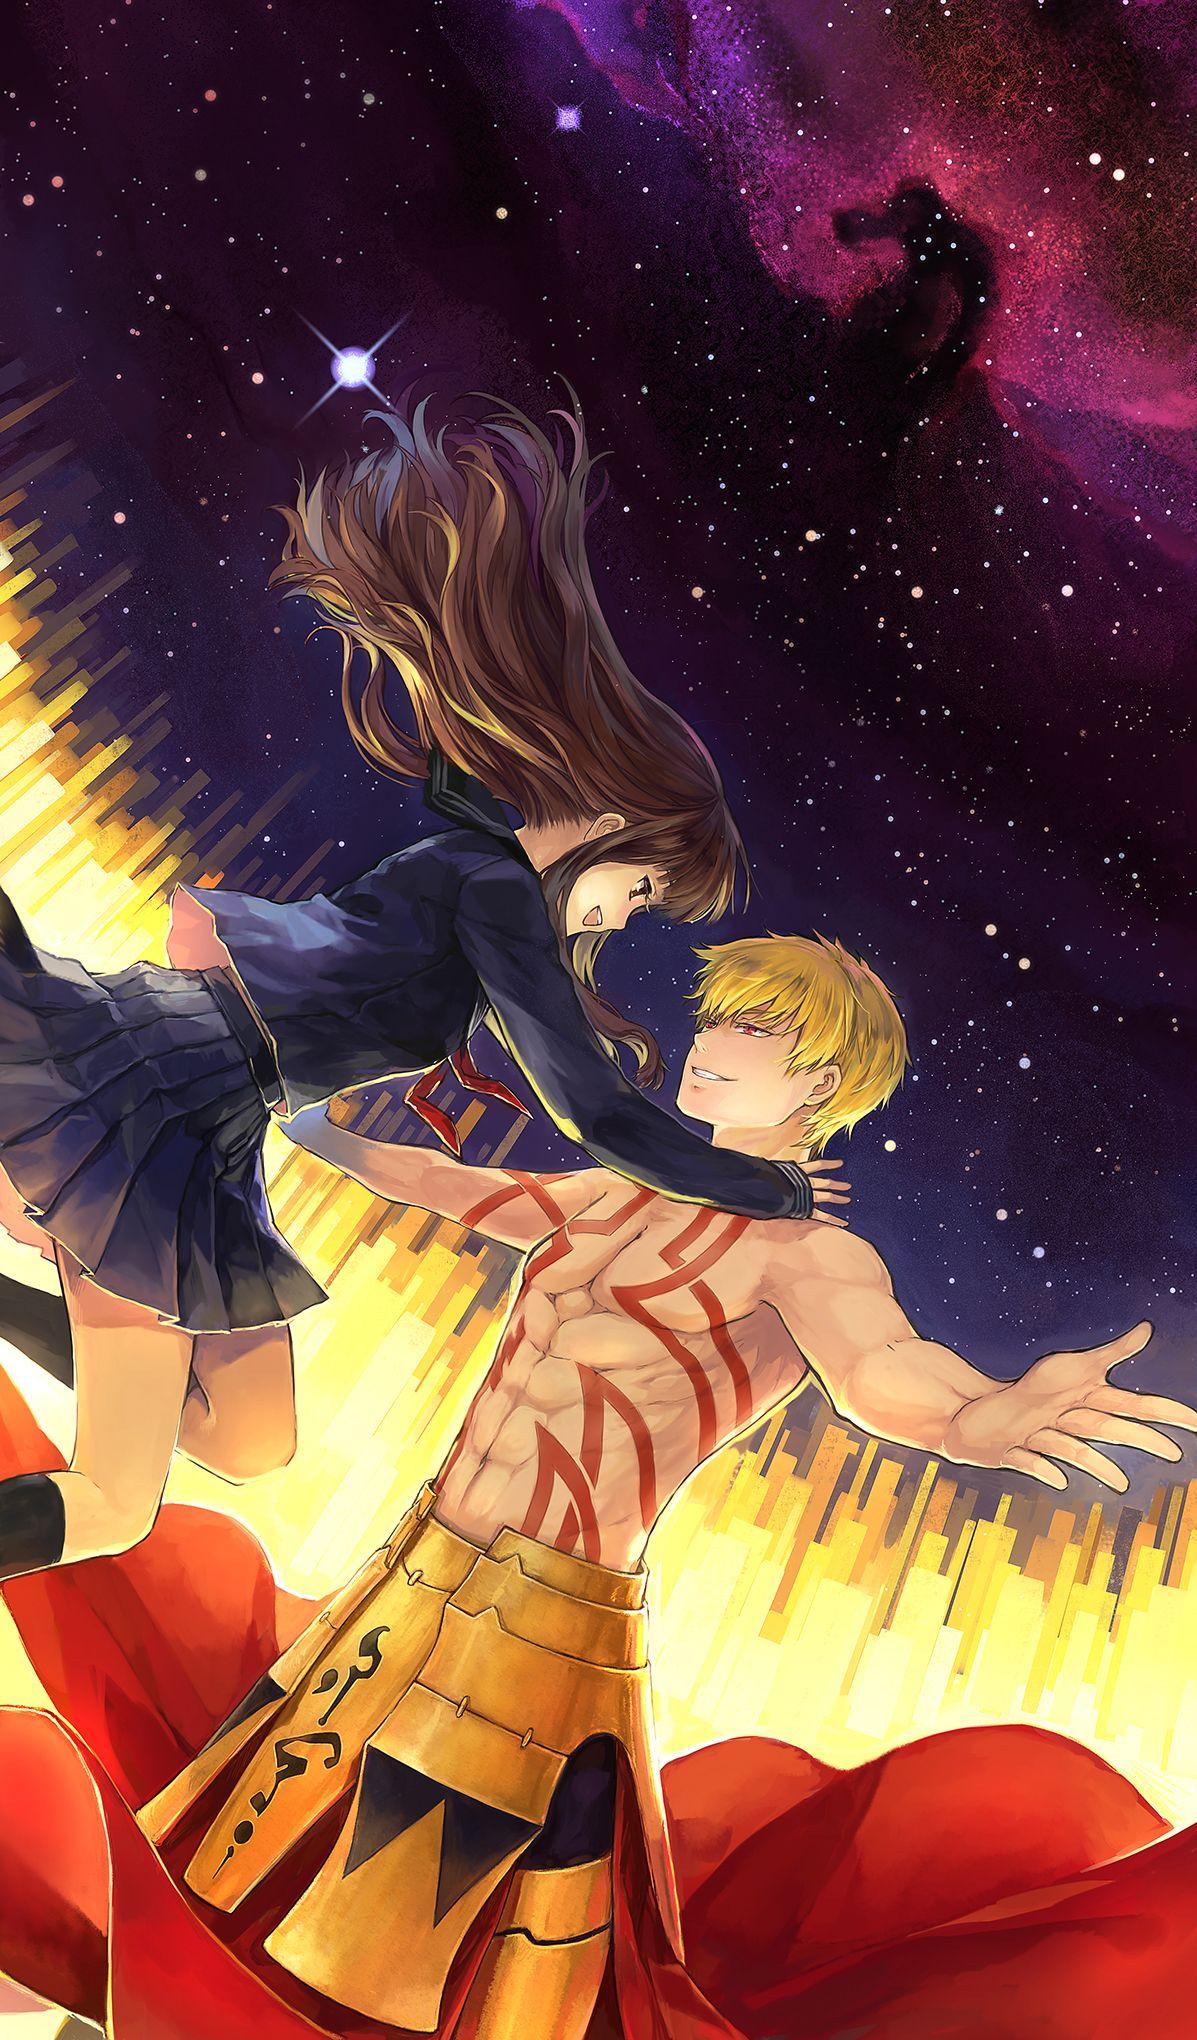 Fate Extra Gilgamesh Fate Anime Fate Anime Series